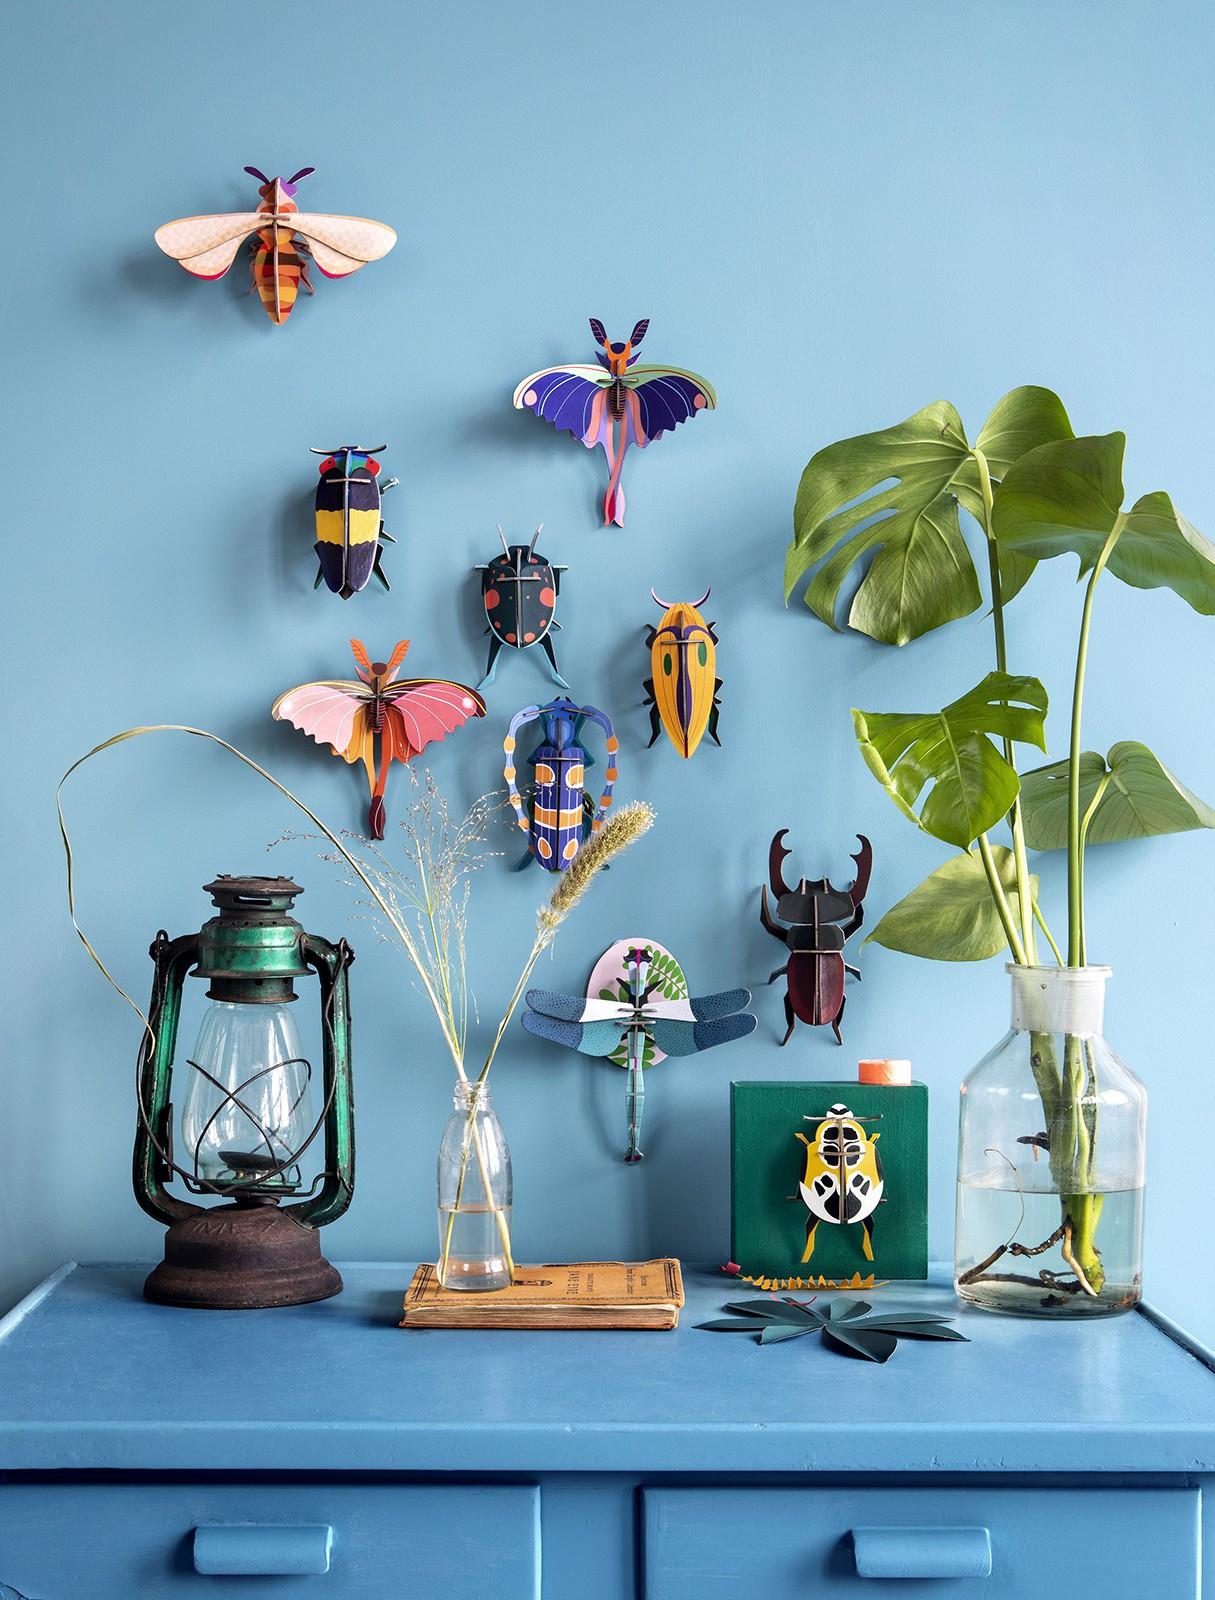 Décoration Blue Comet Butterfly - studio ROOF